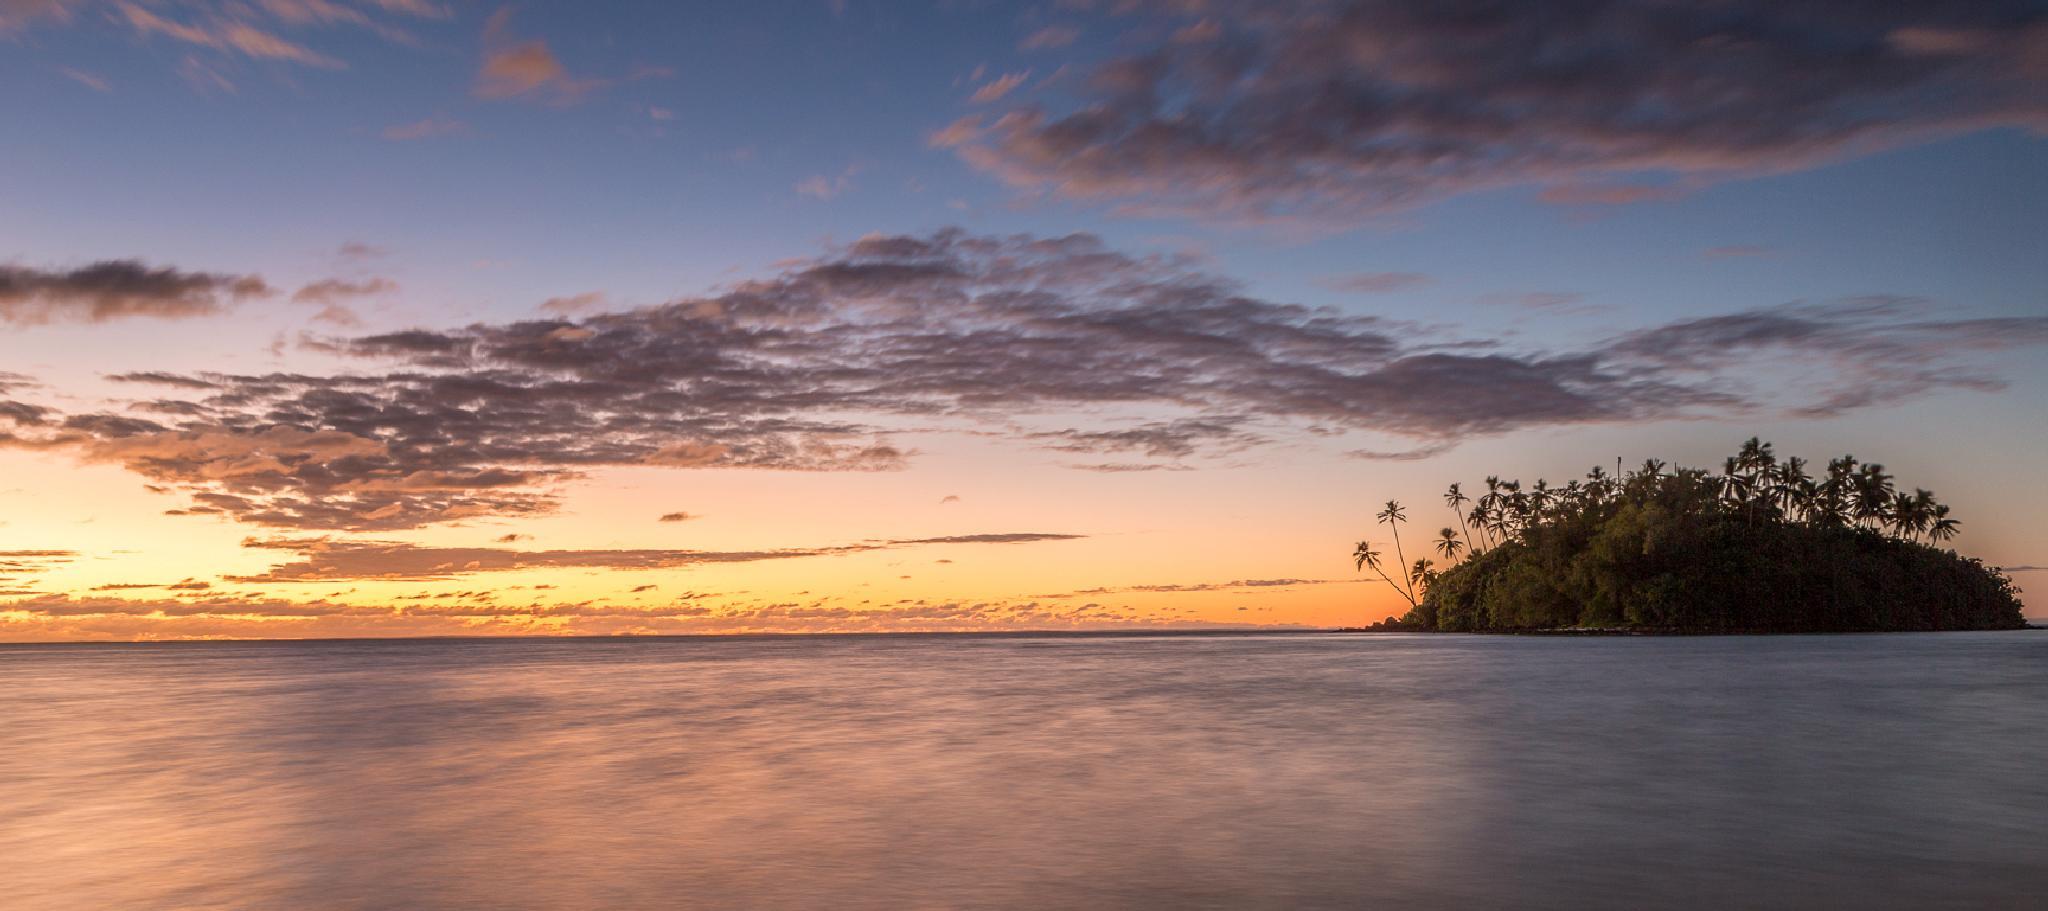 From Muri Beach at sunrise. by sdixon2380